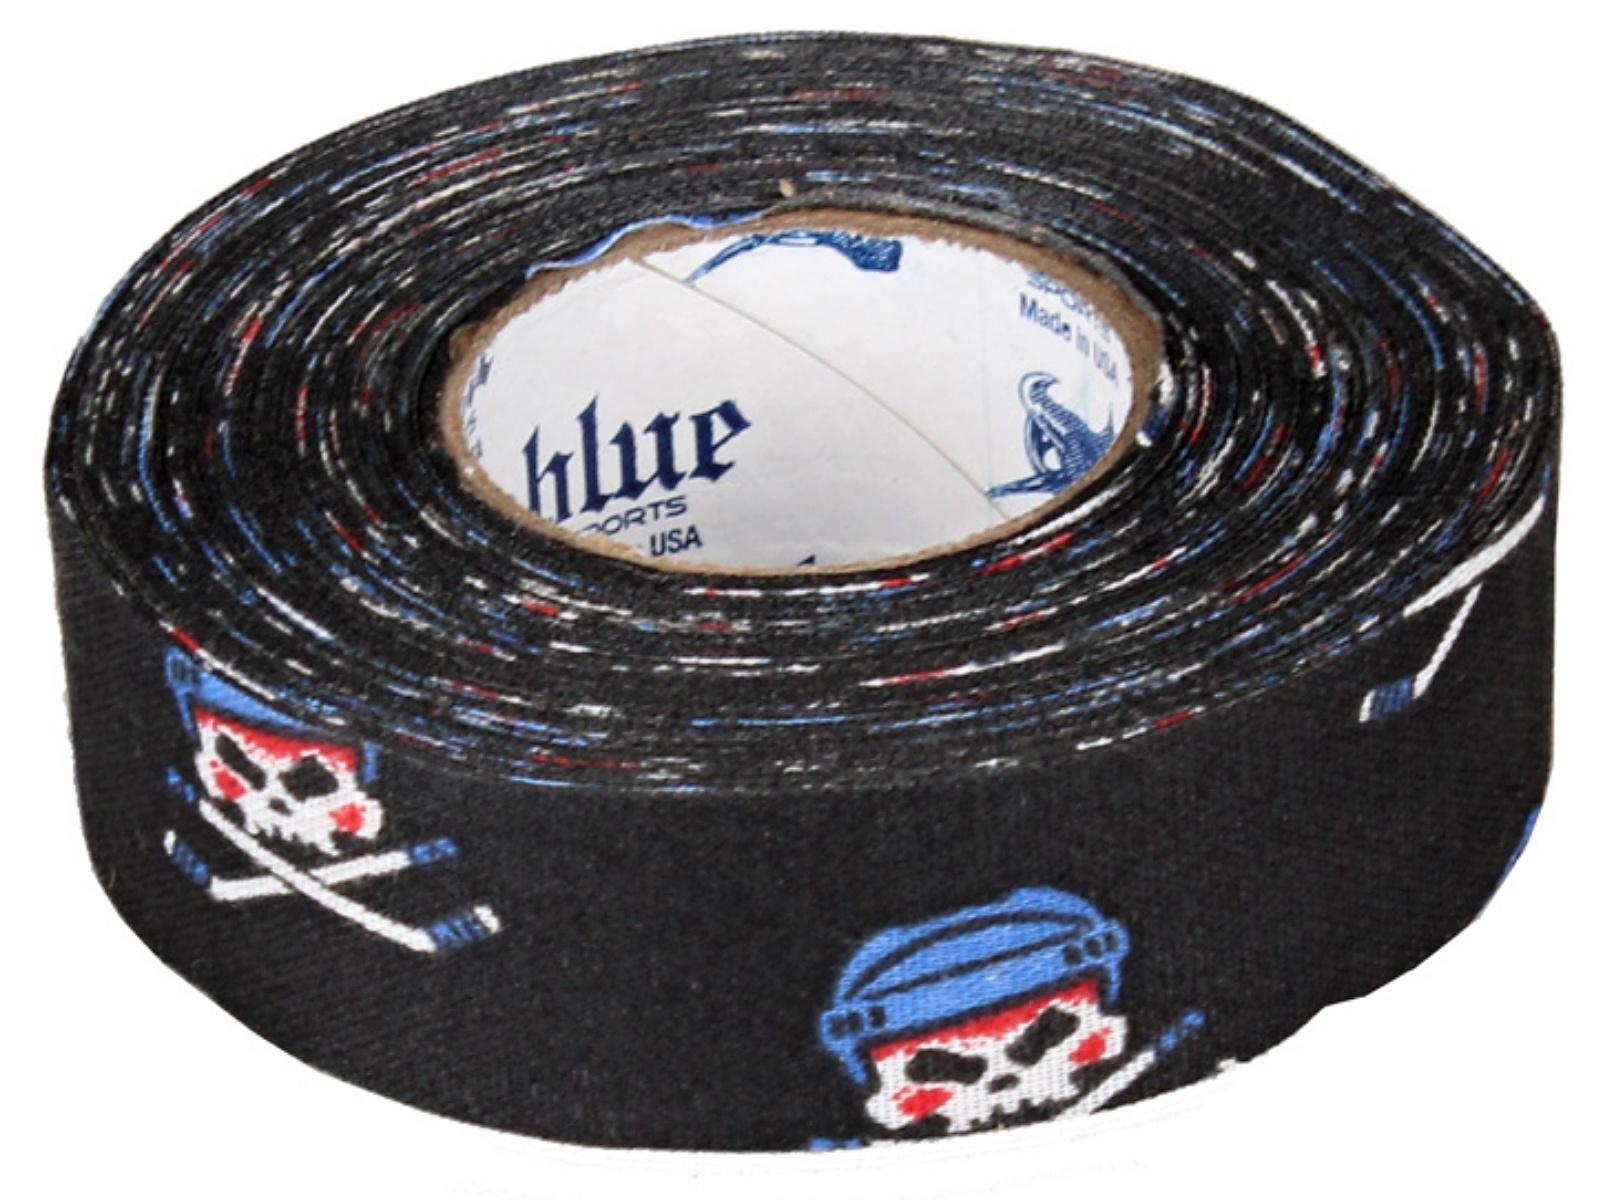 Hokejová páska BLUE Sport 18 m x 2,4 cm, netrhací - Piráti